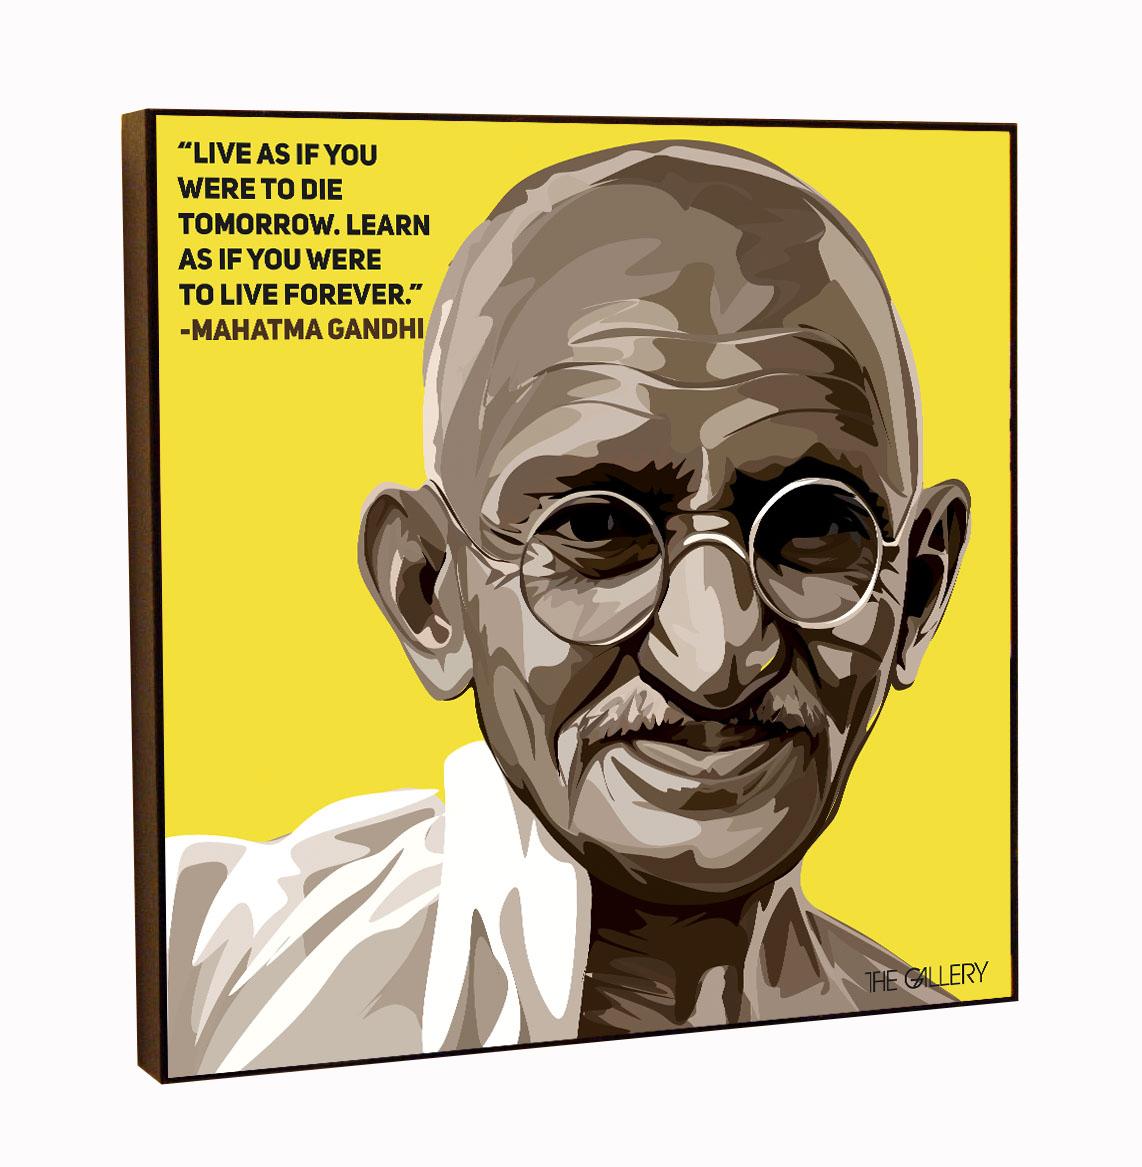 цена Постер The Gallery Картина Махатма Ганди в стиле поп-арт 25 х 25 см, принт + МДФ, Оргалит онлайн в 2017 году